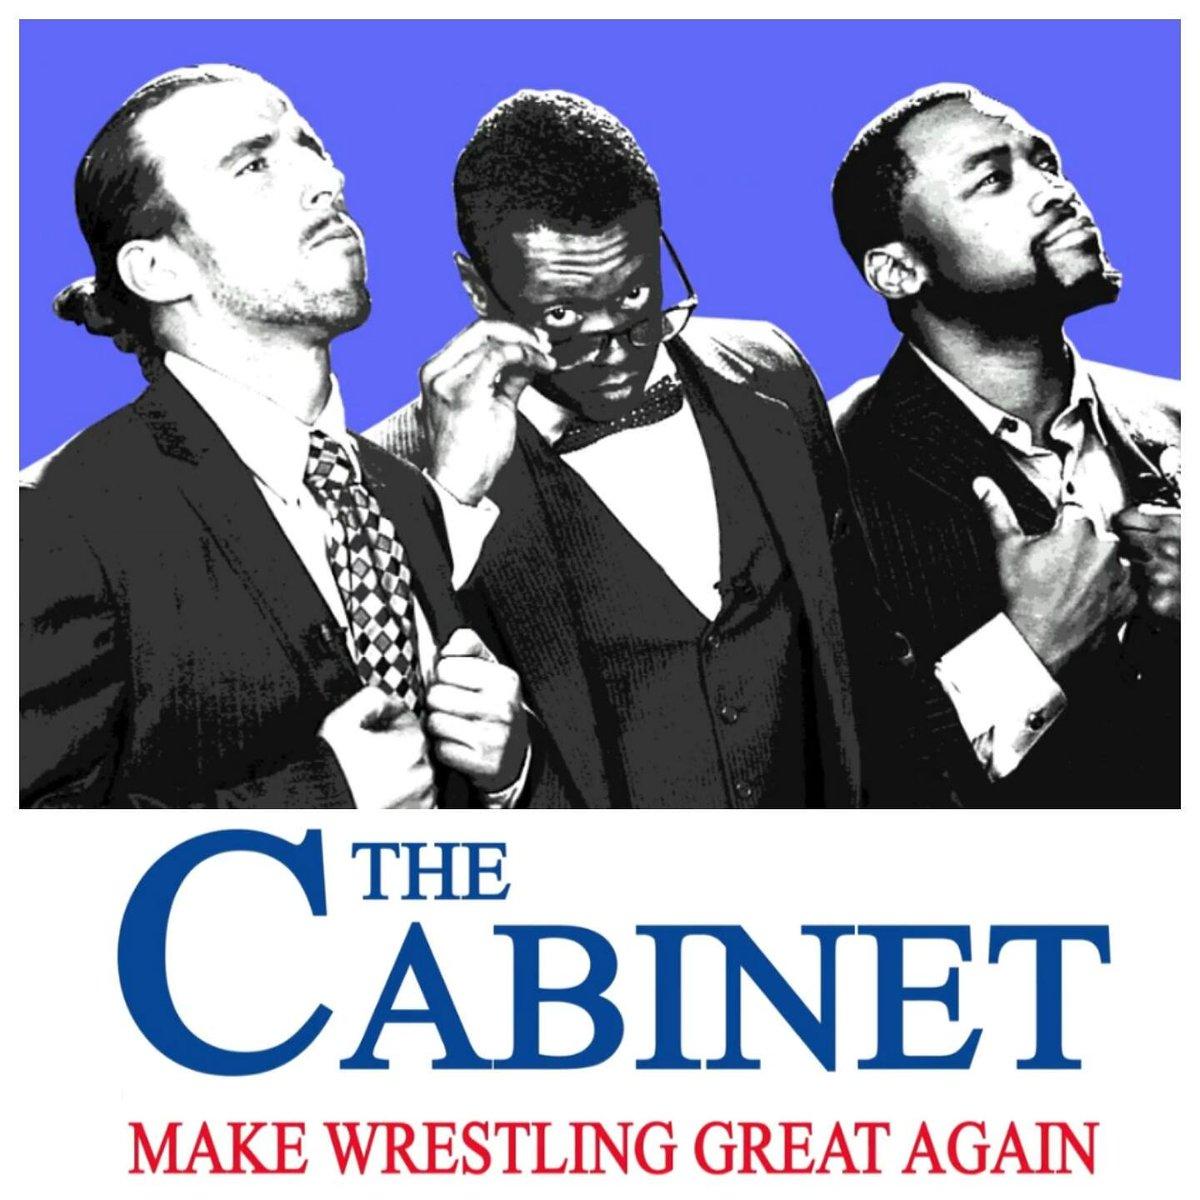 The Cabinet WILL make wrestling great again. #watchroh @CapriceColeman  @RhettTitusANX  @KennyKingPb2 @ringofhonor https://t.co/ELBhhq2BEZ